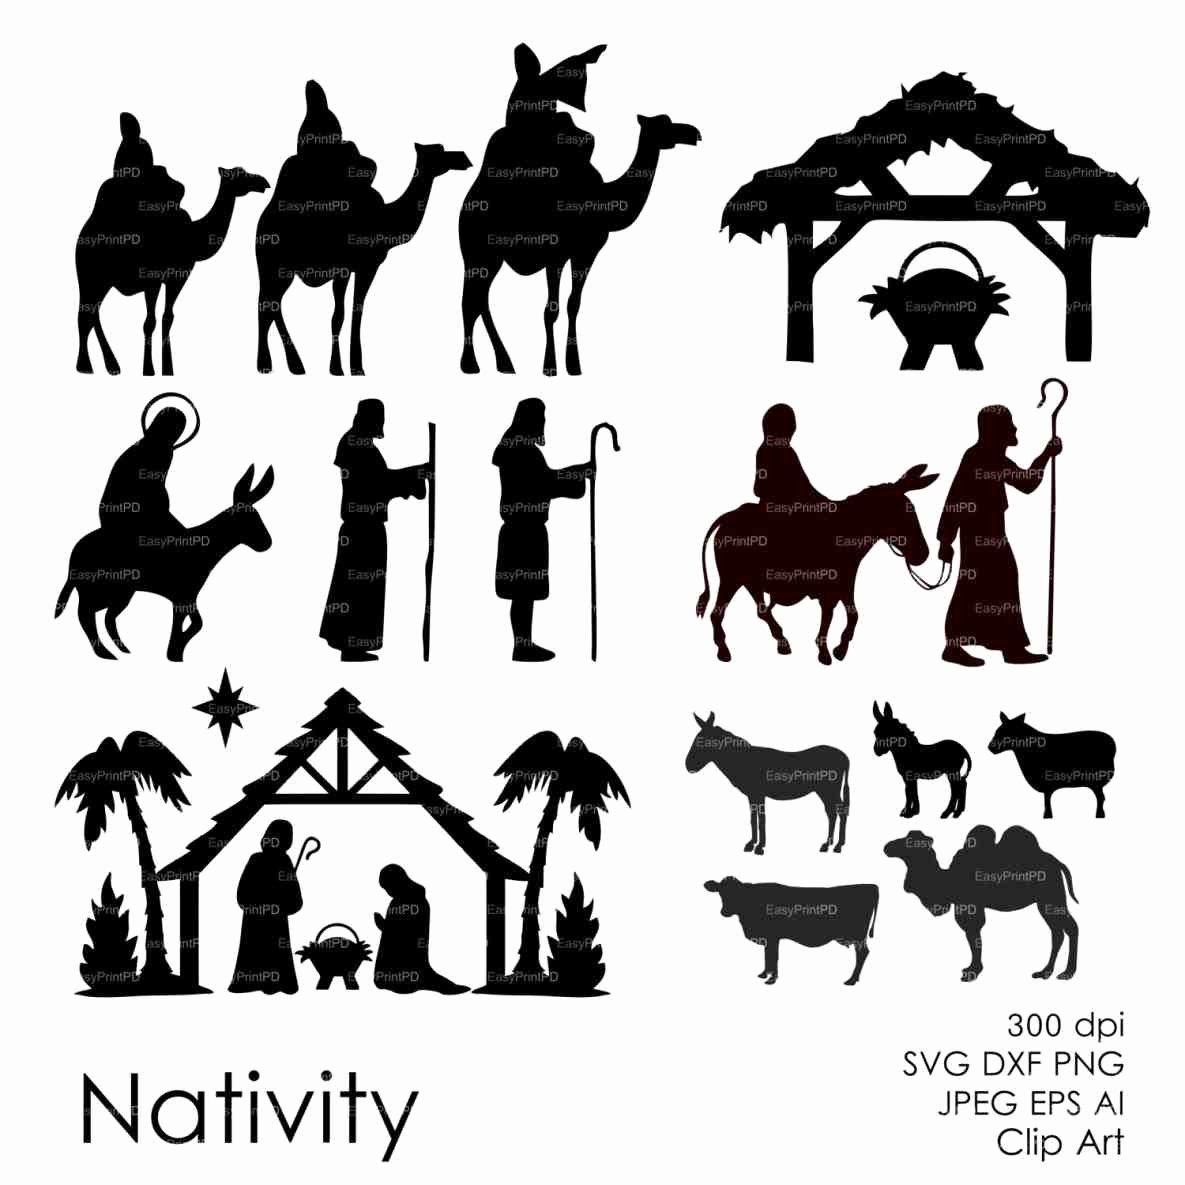 Silhouette Nativity Scene Pattern Unique Nativity Silhouette Patterns Download